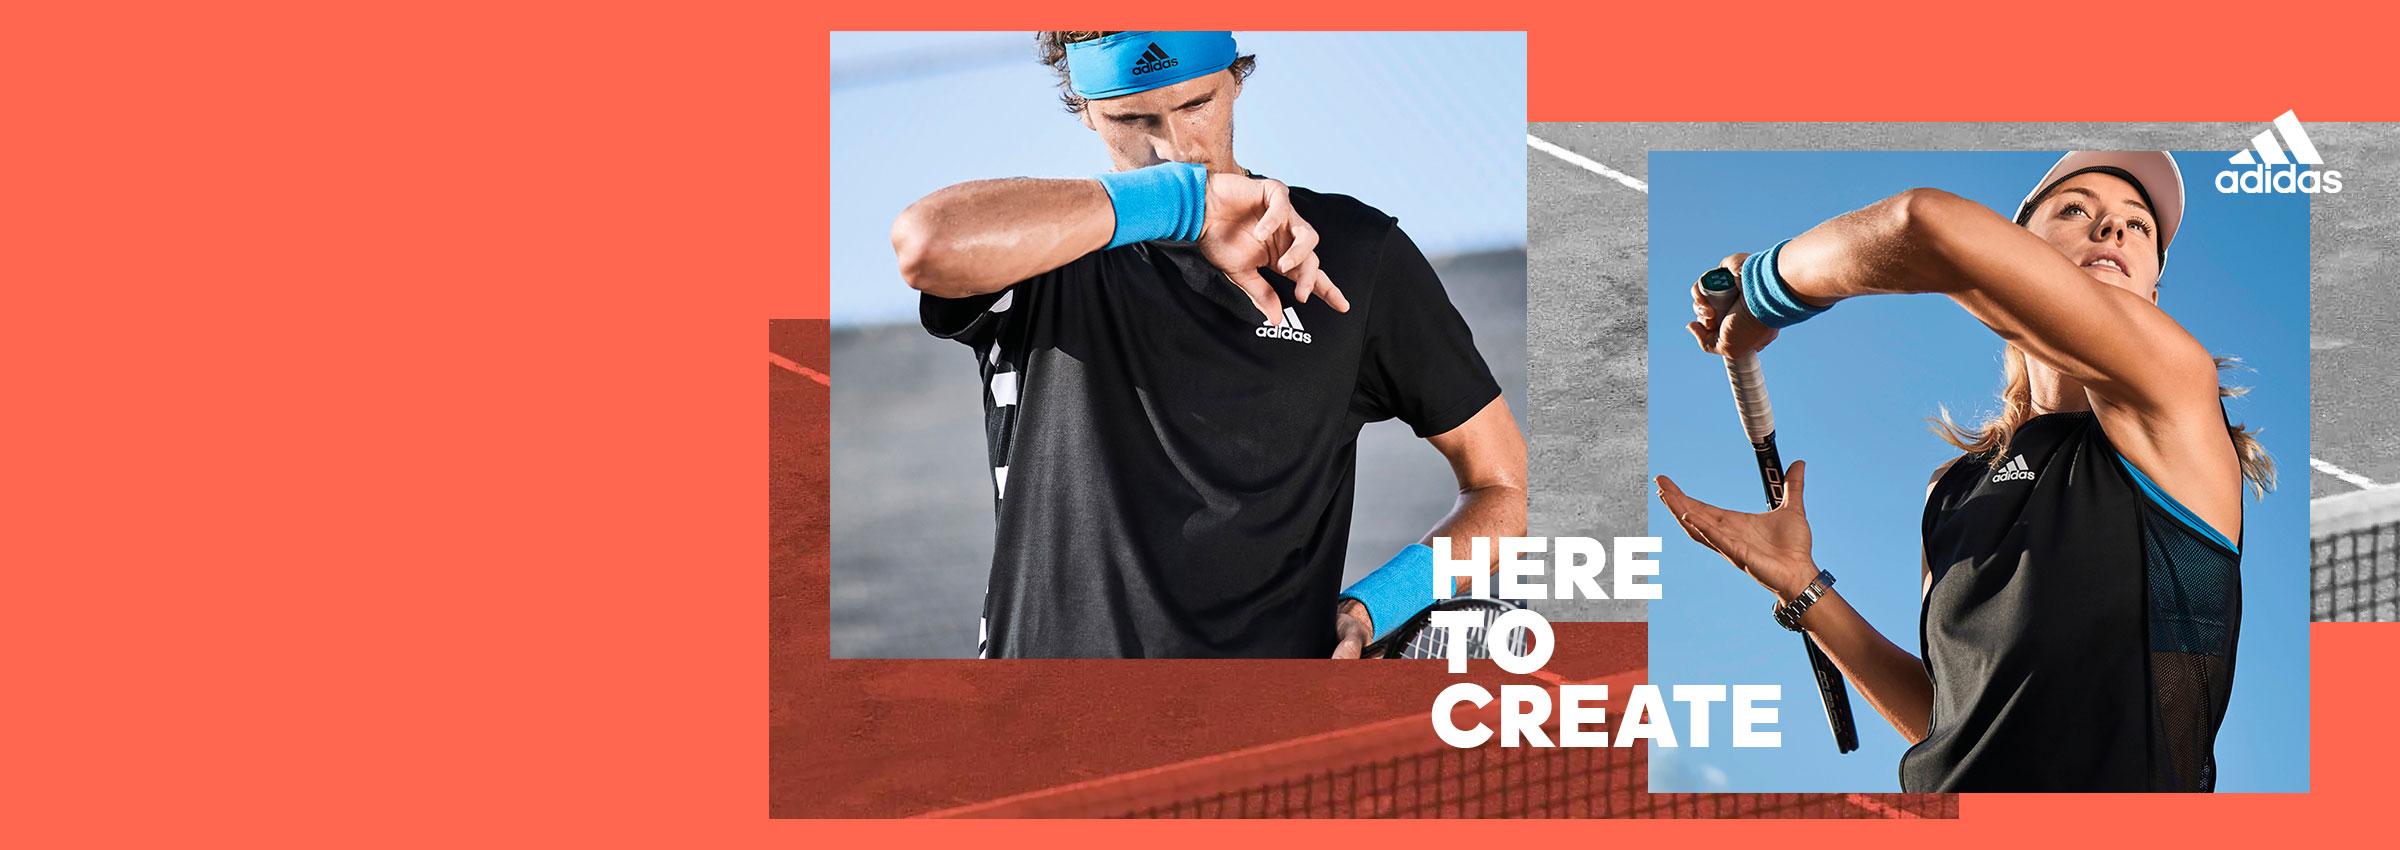 Adidas Roland Garros 2019